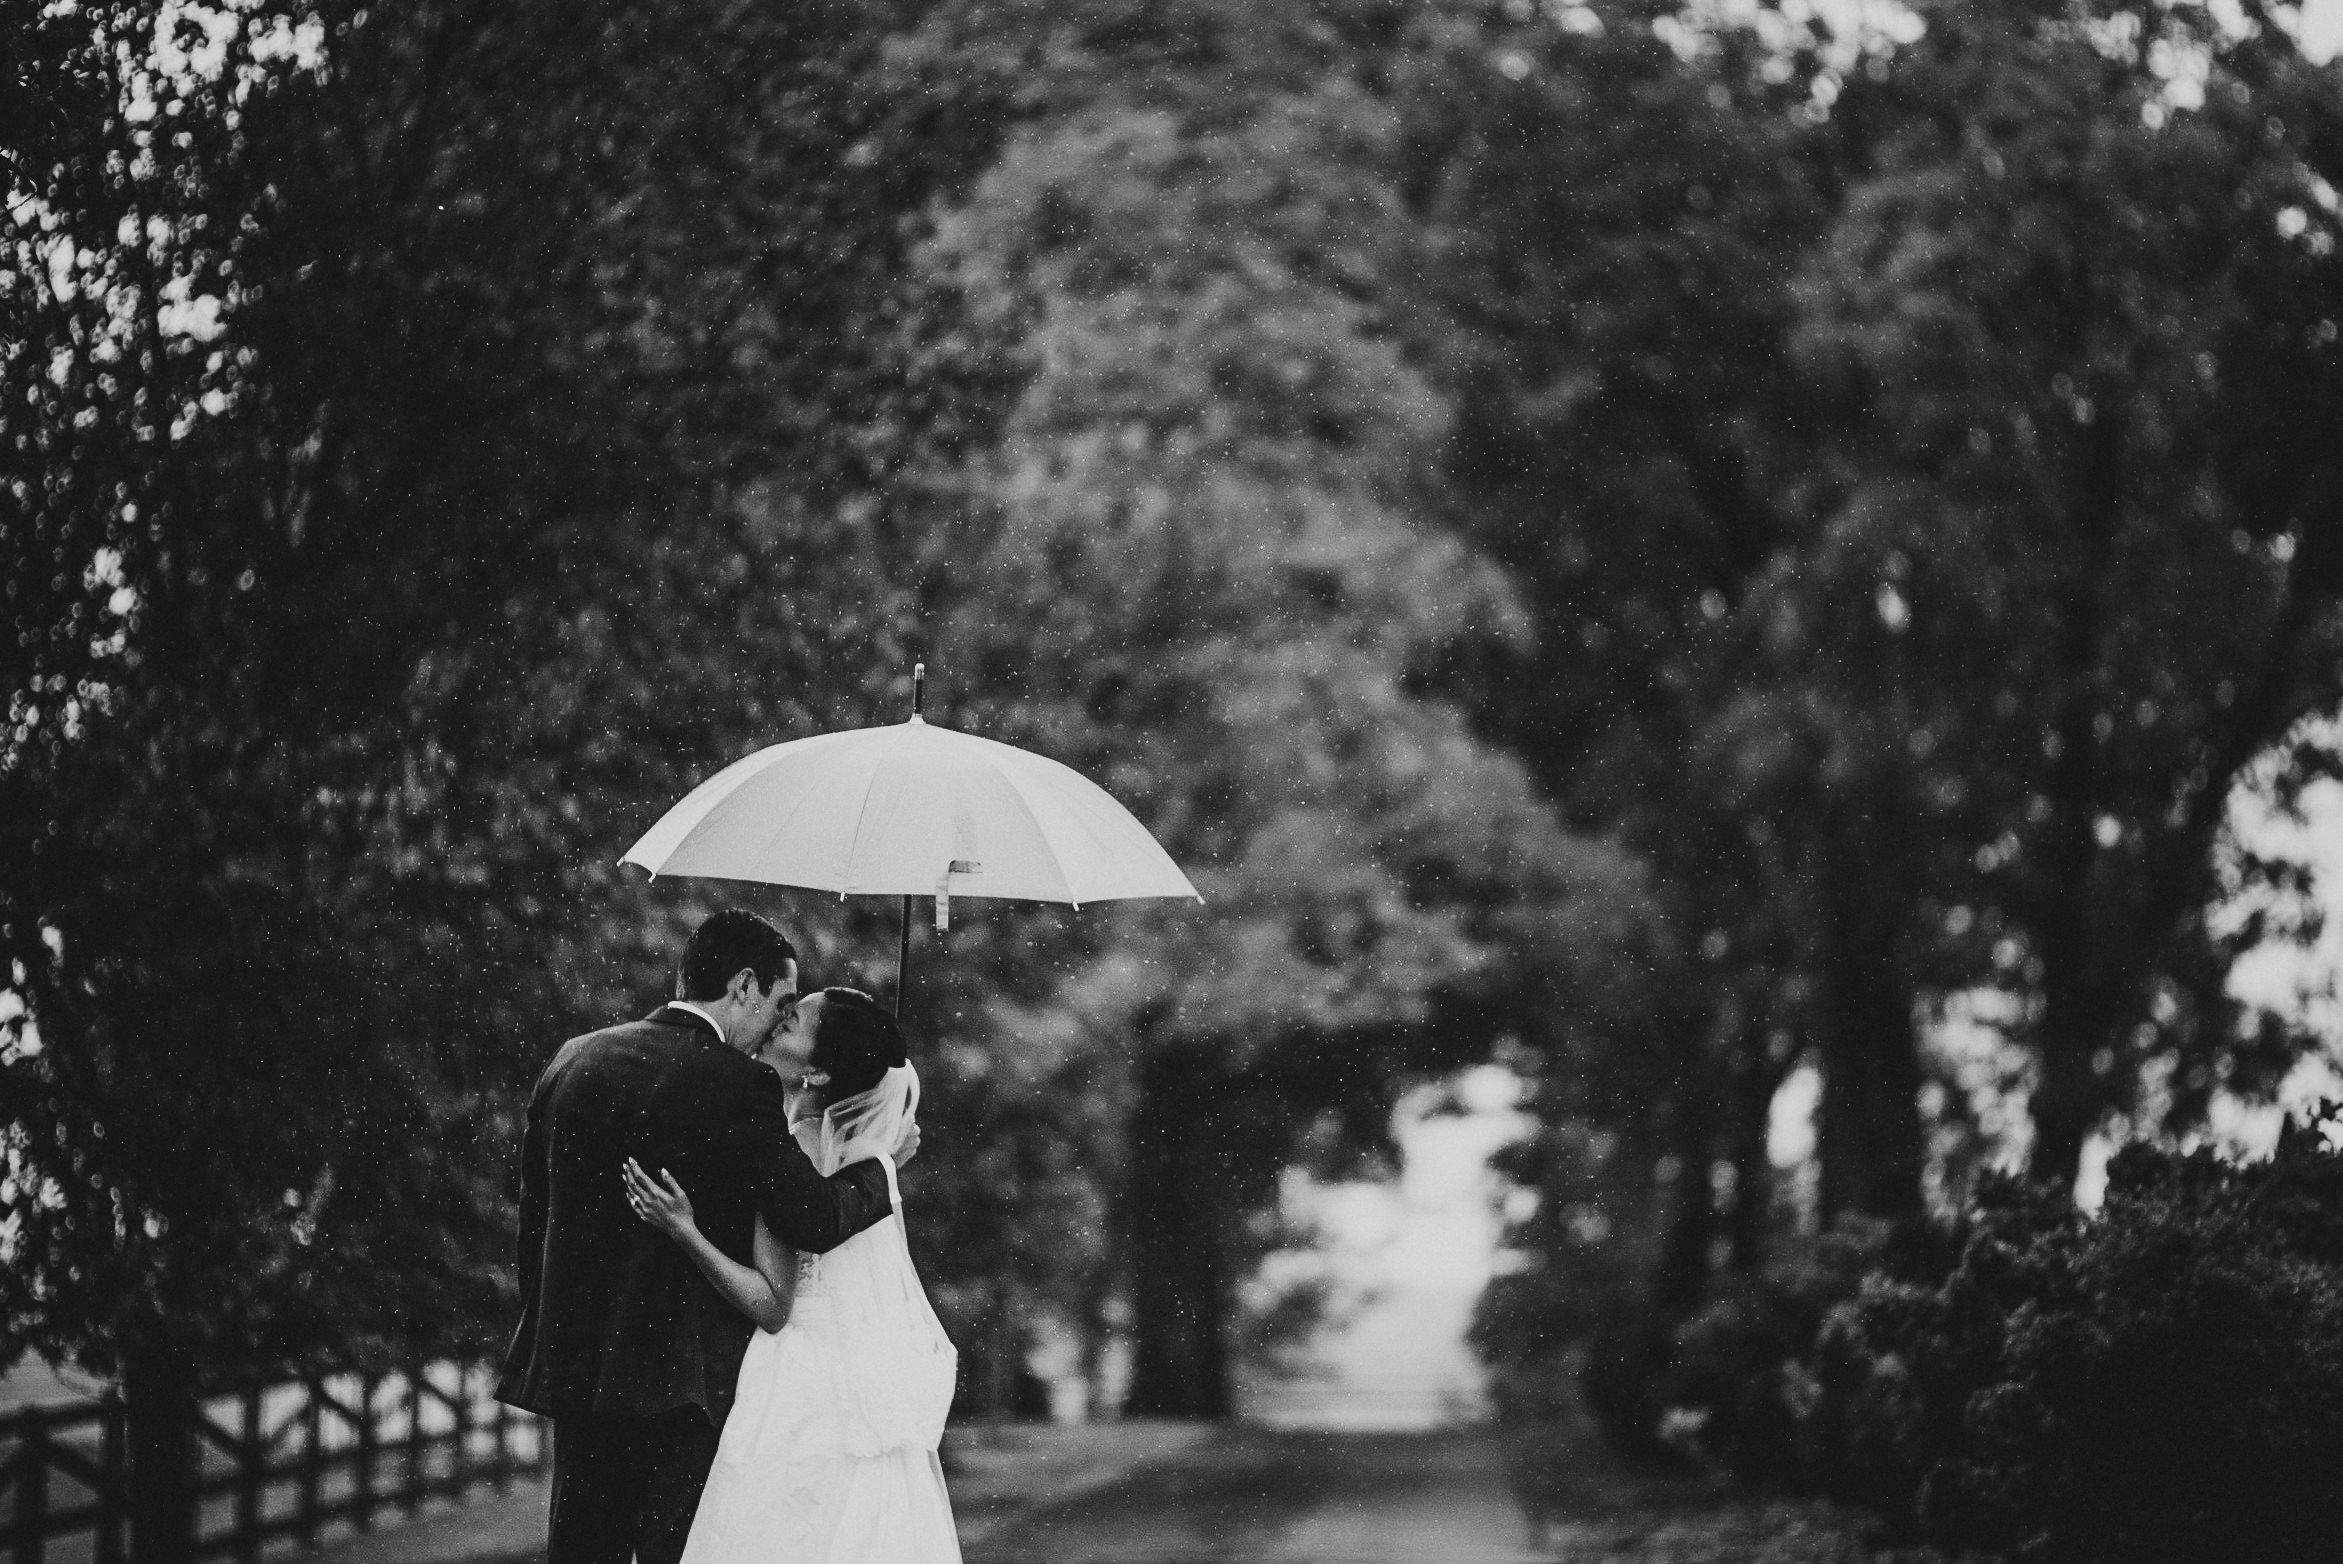 Wedding at Woodlawn Manor Sandy Spring Maryland by Mantas Kubilinskas-21.jpg